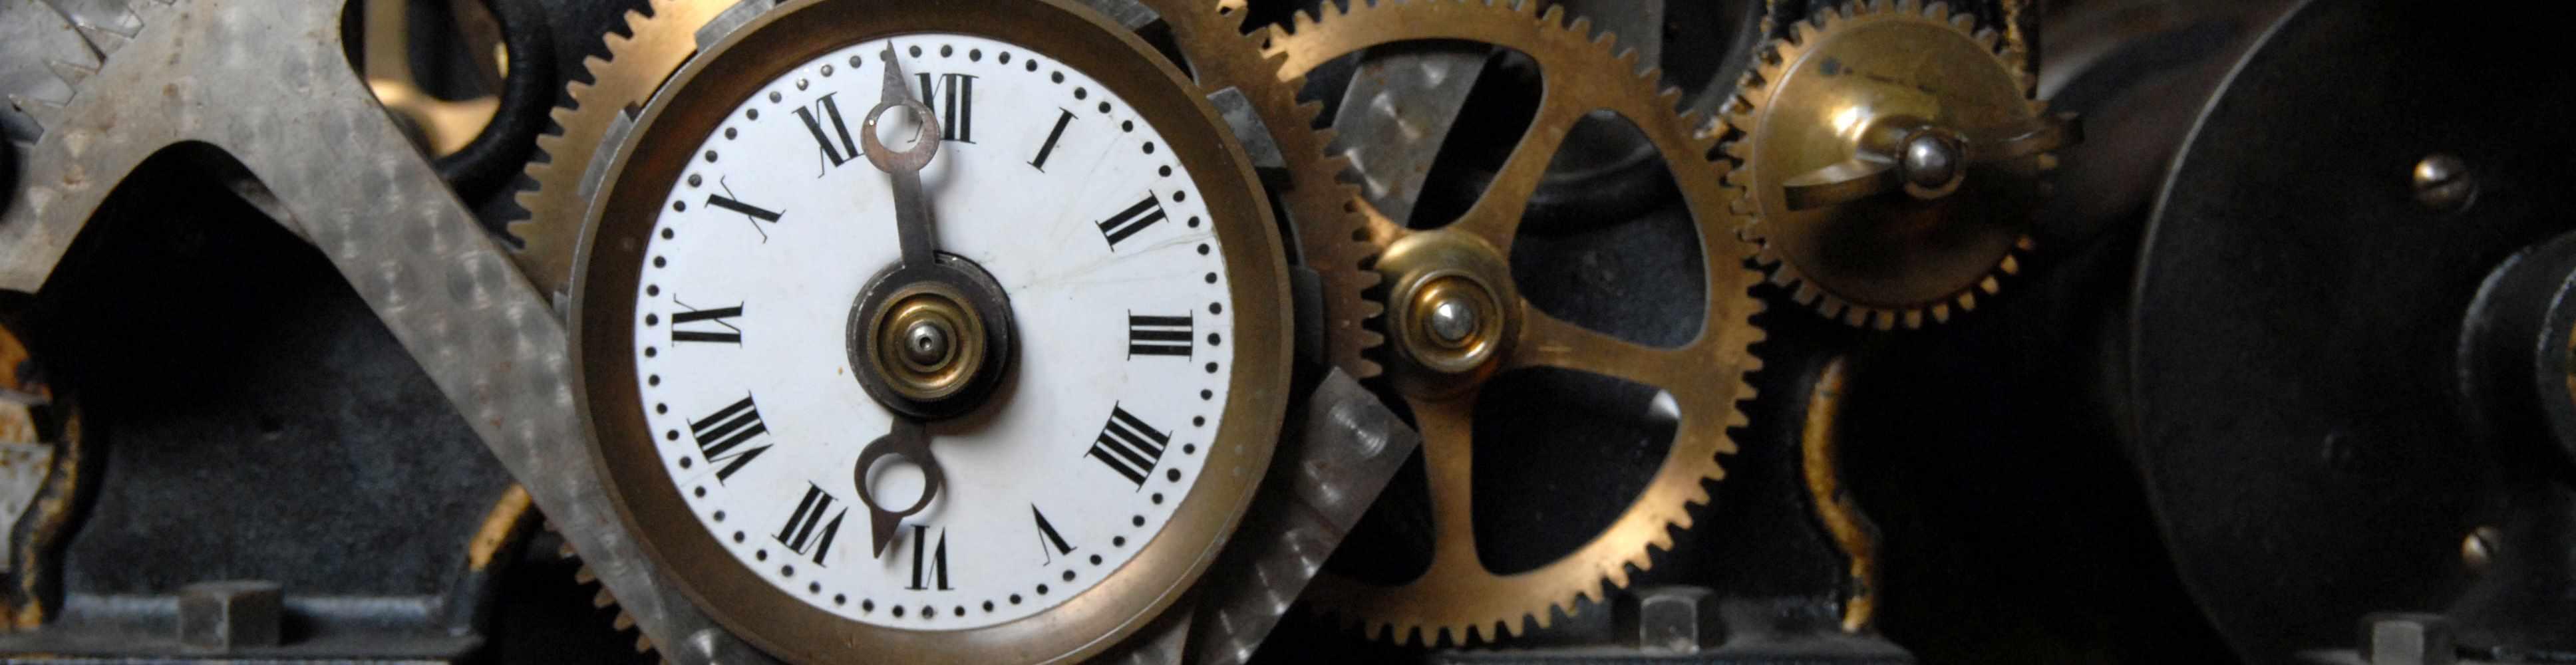 horloge anne et thierry brocante